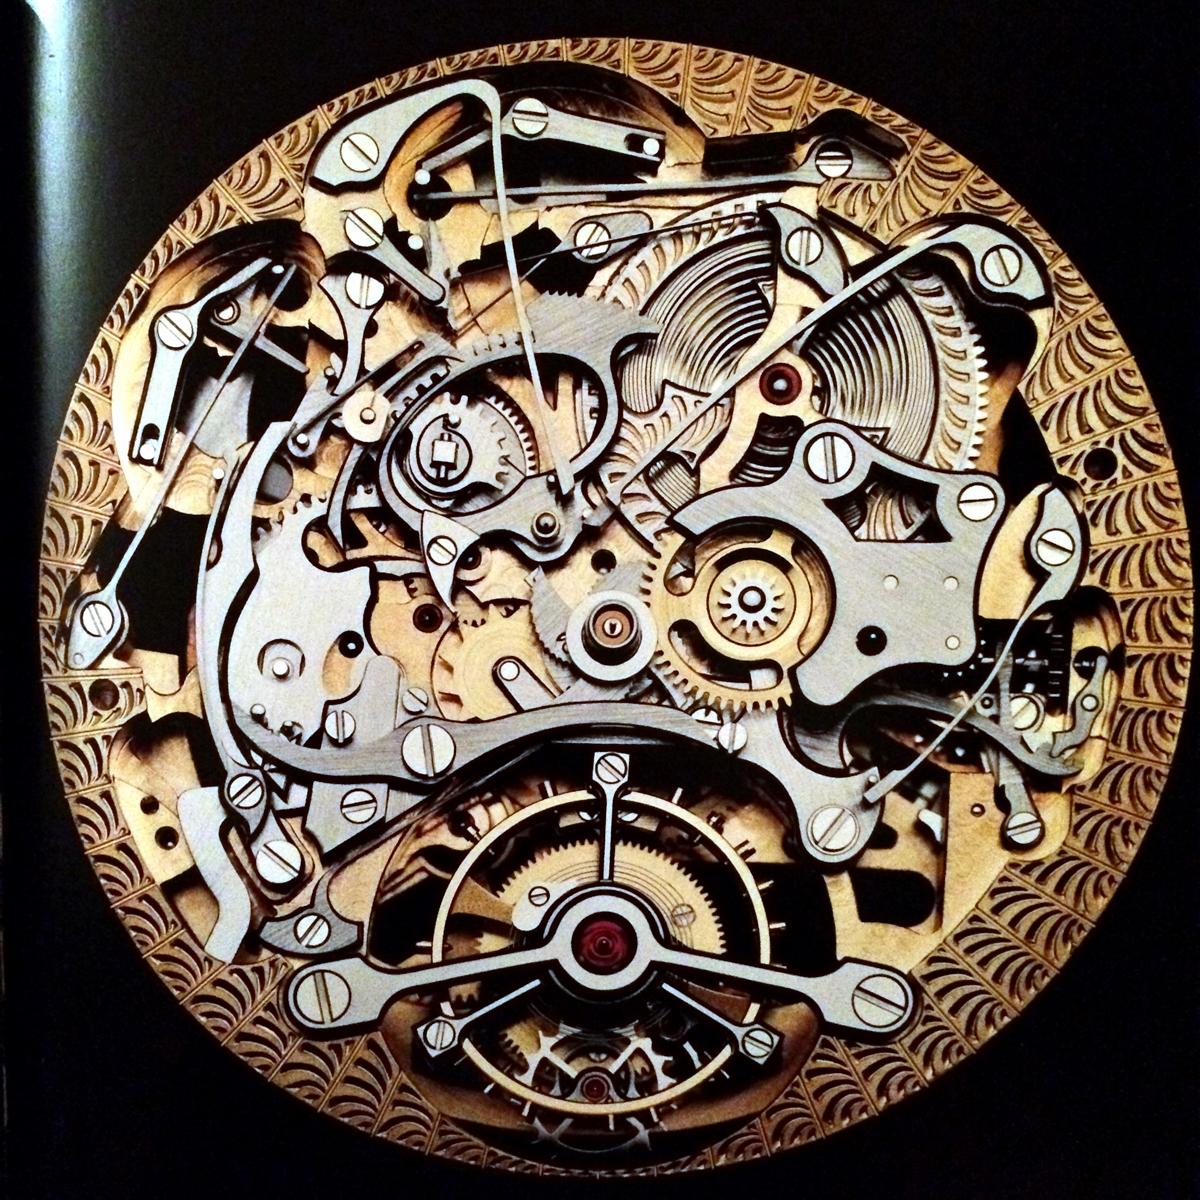 19 design z zegarkiem w ręku luksusowe zegarki SIHH Geneve lifestyle forelements blog